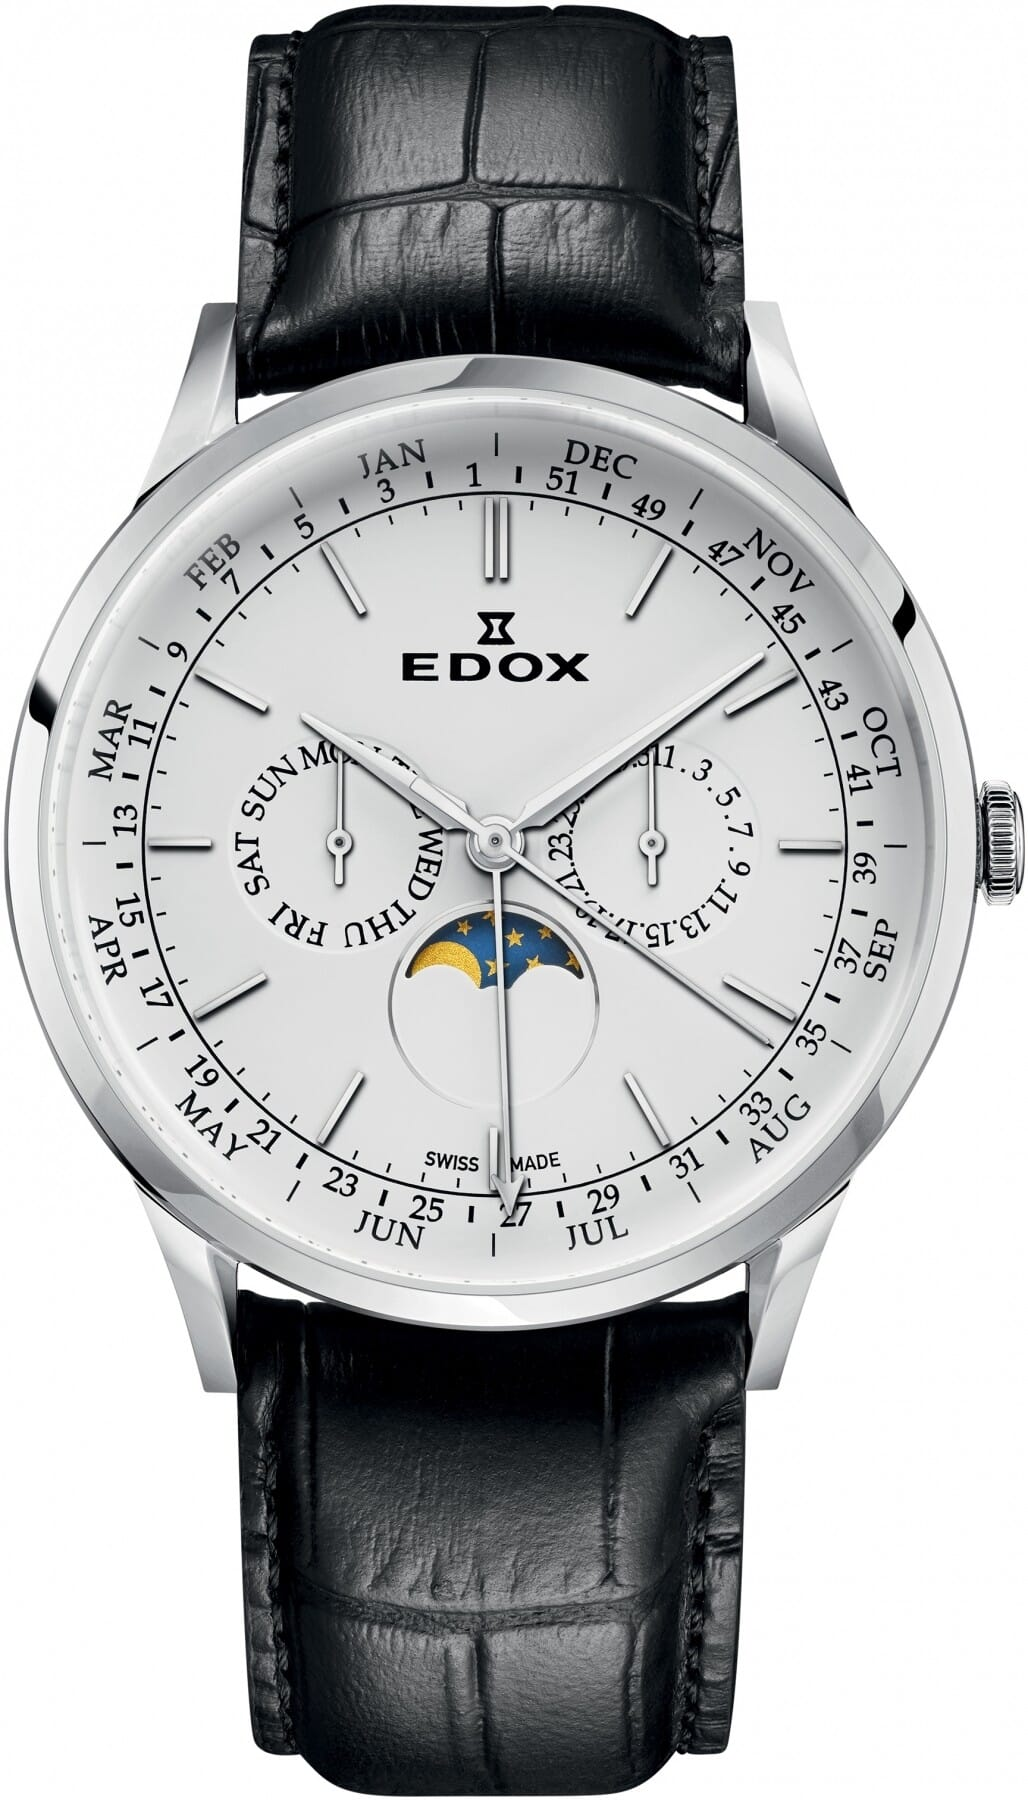 Edox 40101 3C AIN